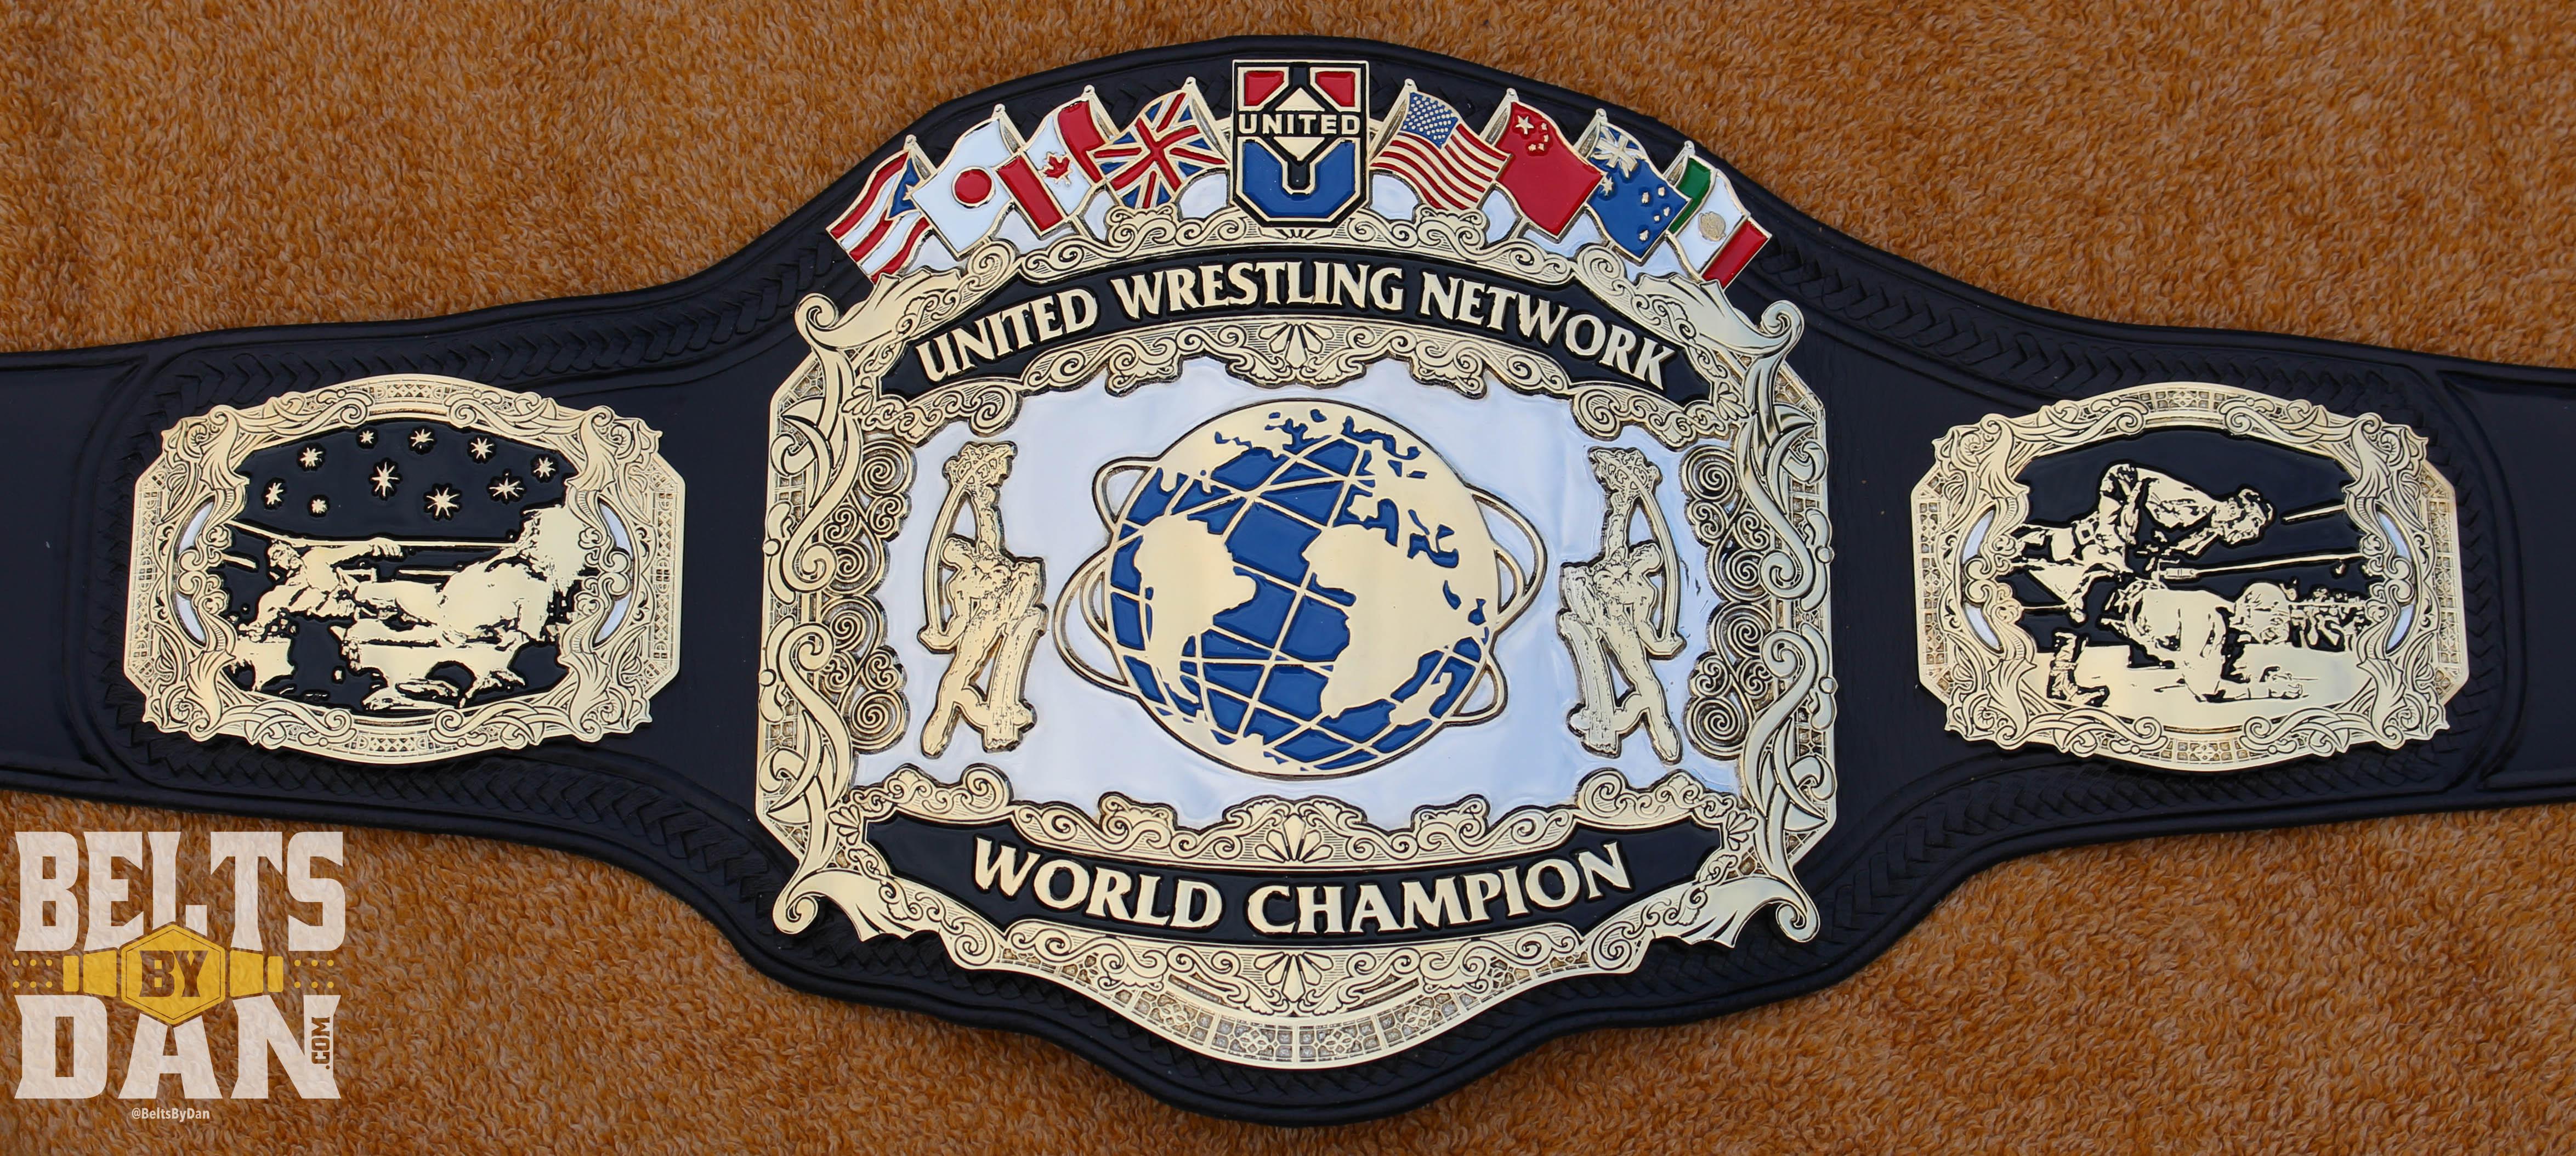 United Wrestling Network World Championship Belts By Dan